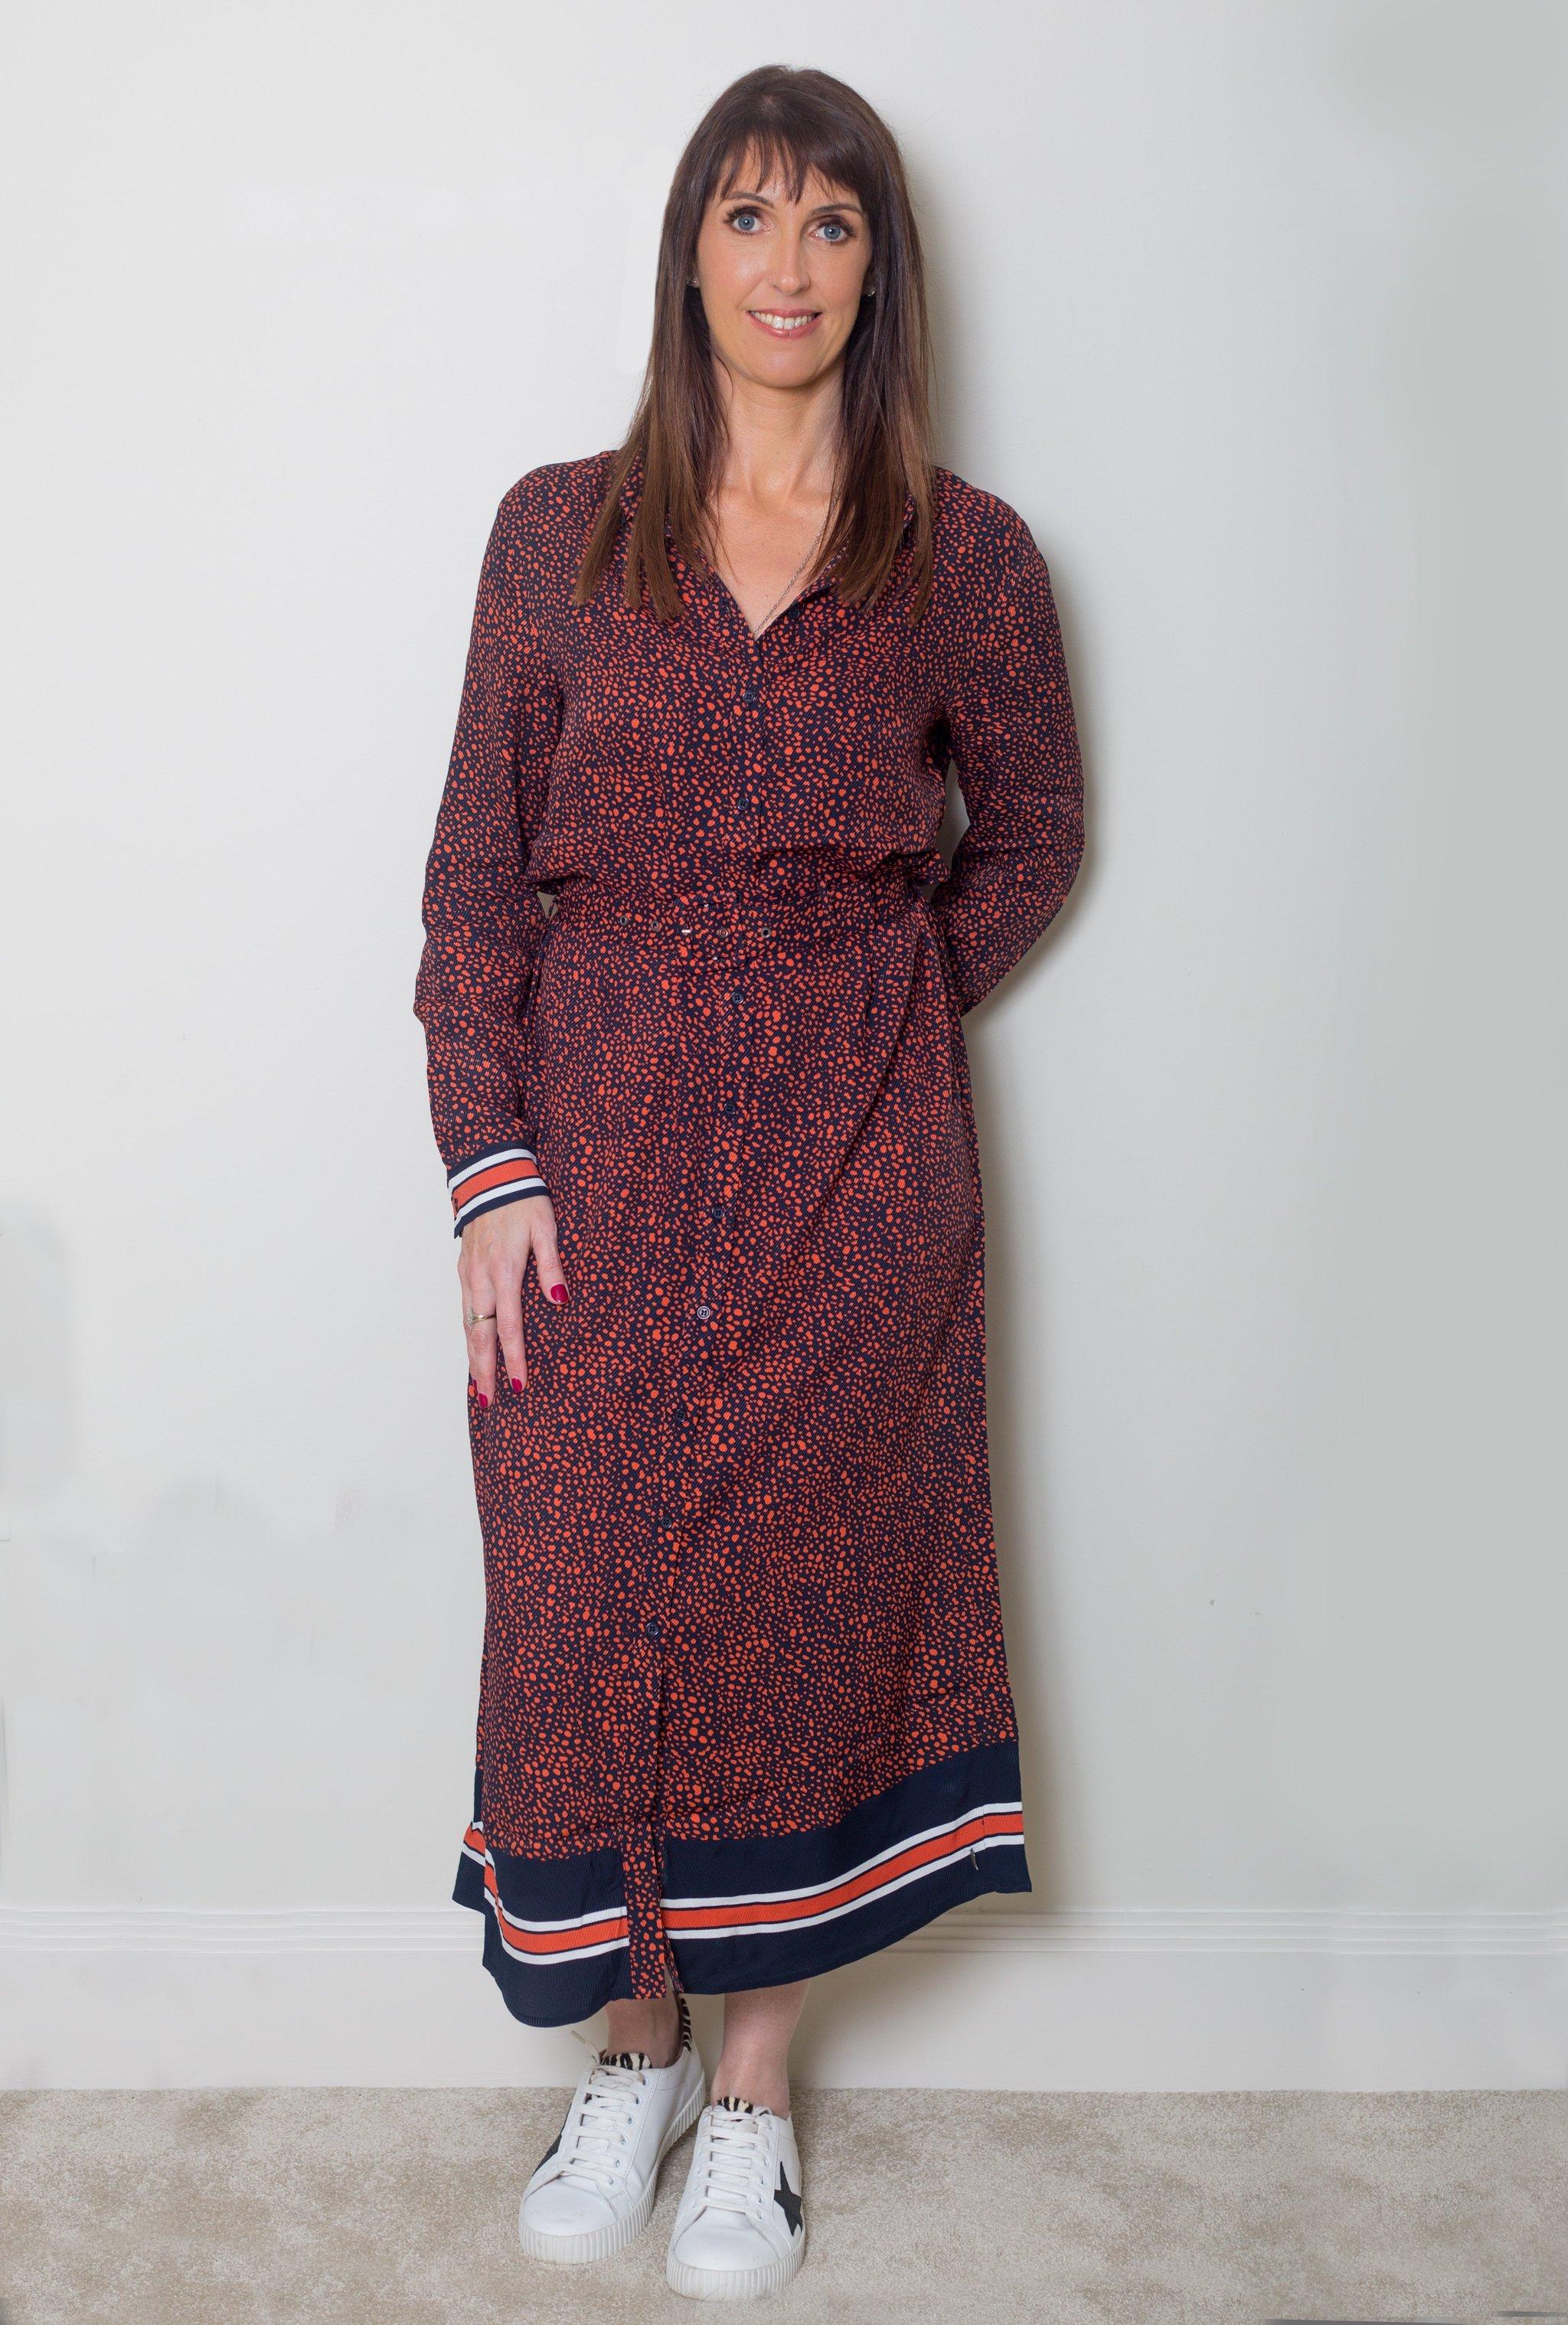 COSTER COPENHAGEN LONG SHIRT DRESS IN RAIN PRINT Image